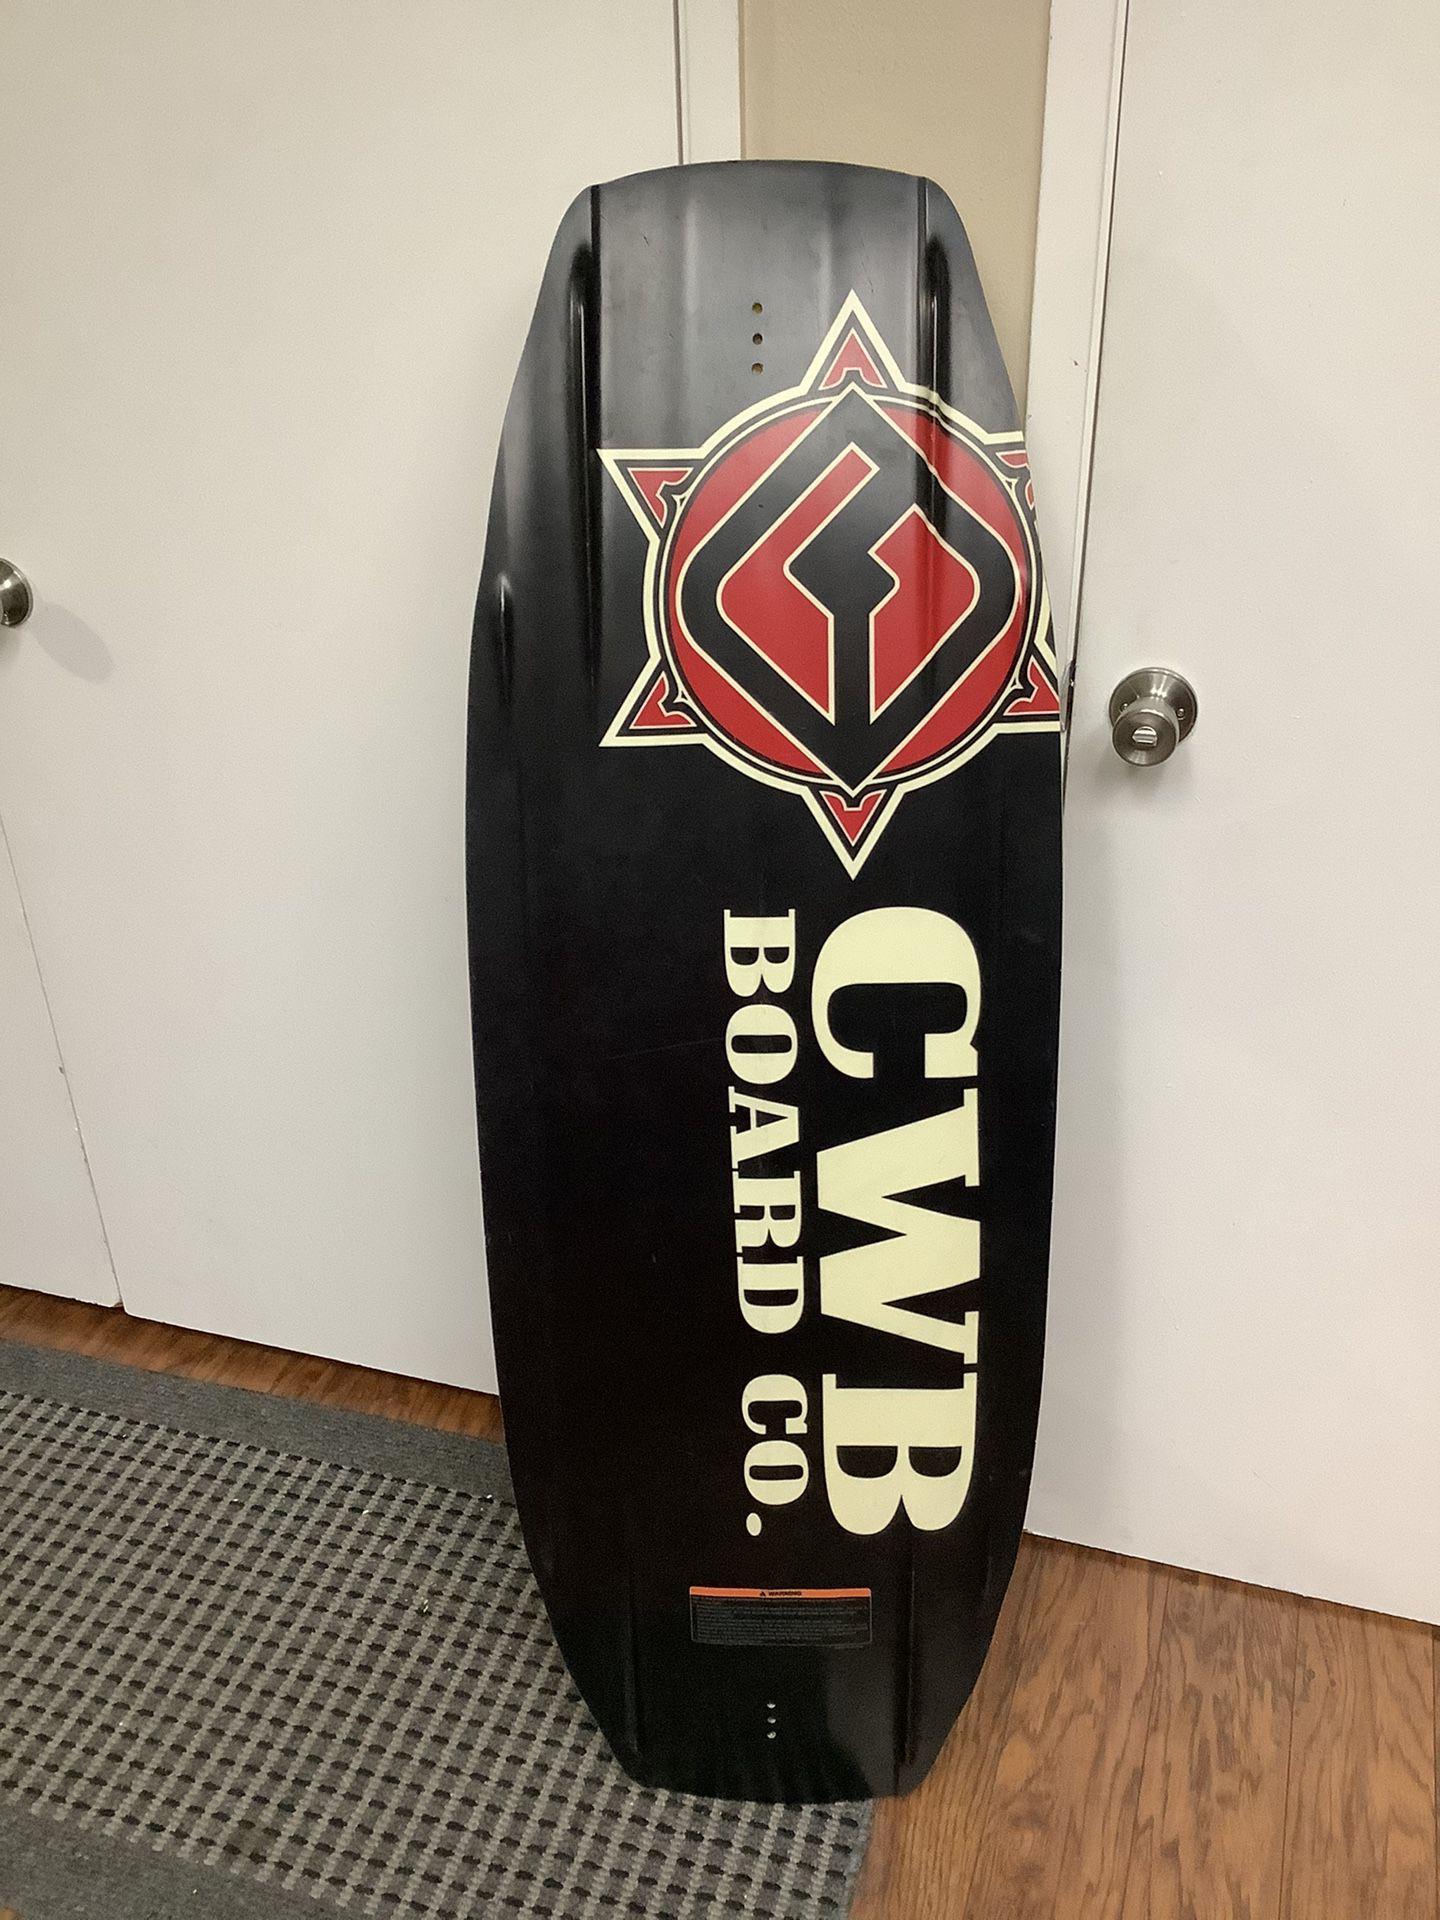 134 cwb Faze wakeboard men's 5-8 cwb Toro bindings